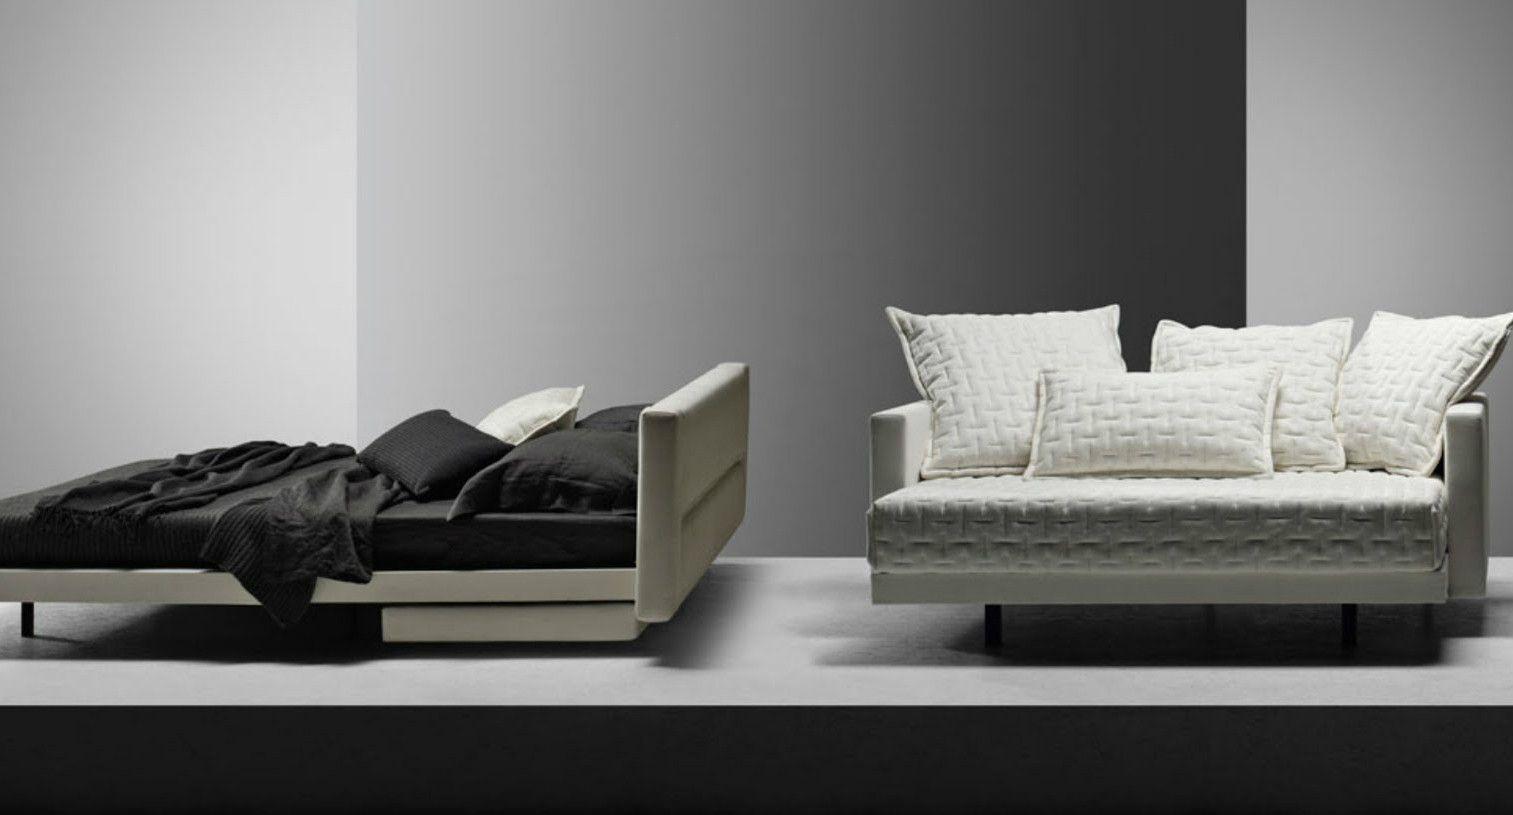 - Oz Sofa Collection By Molteni & C Sofa Bed Design, Sofa, Bed